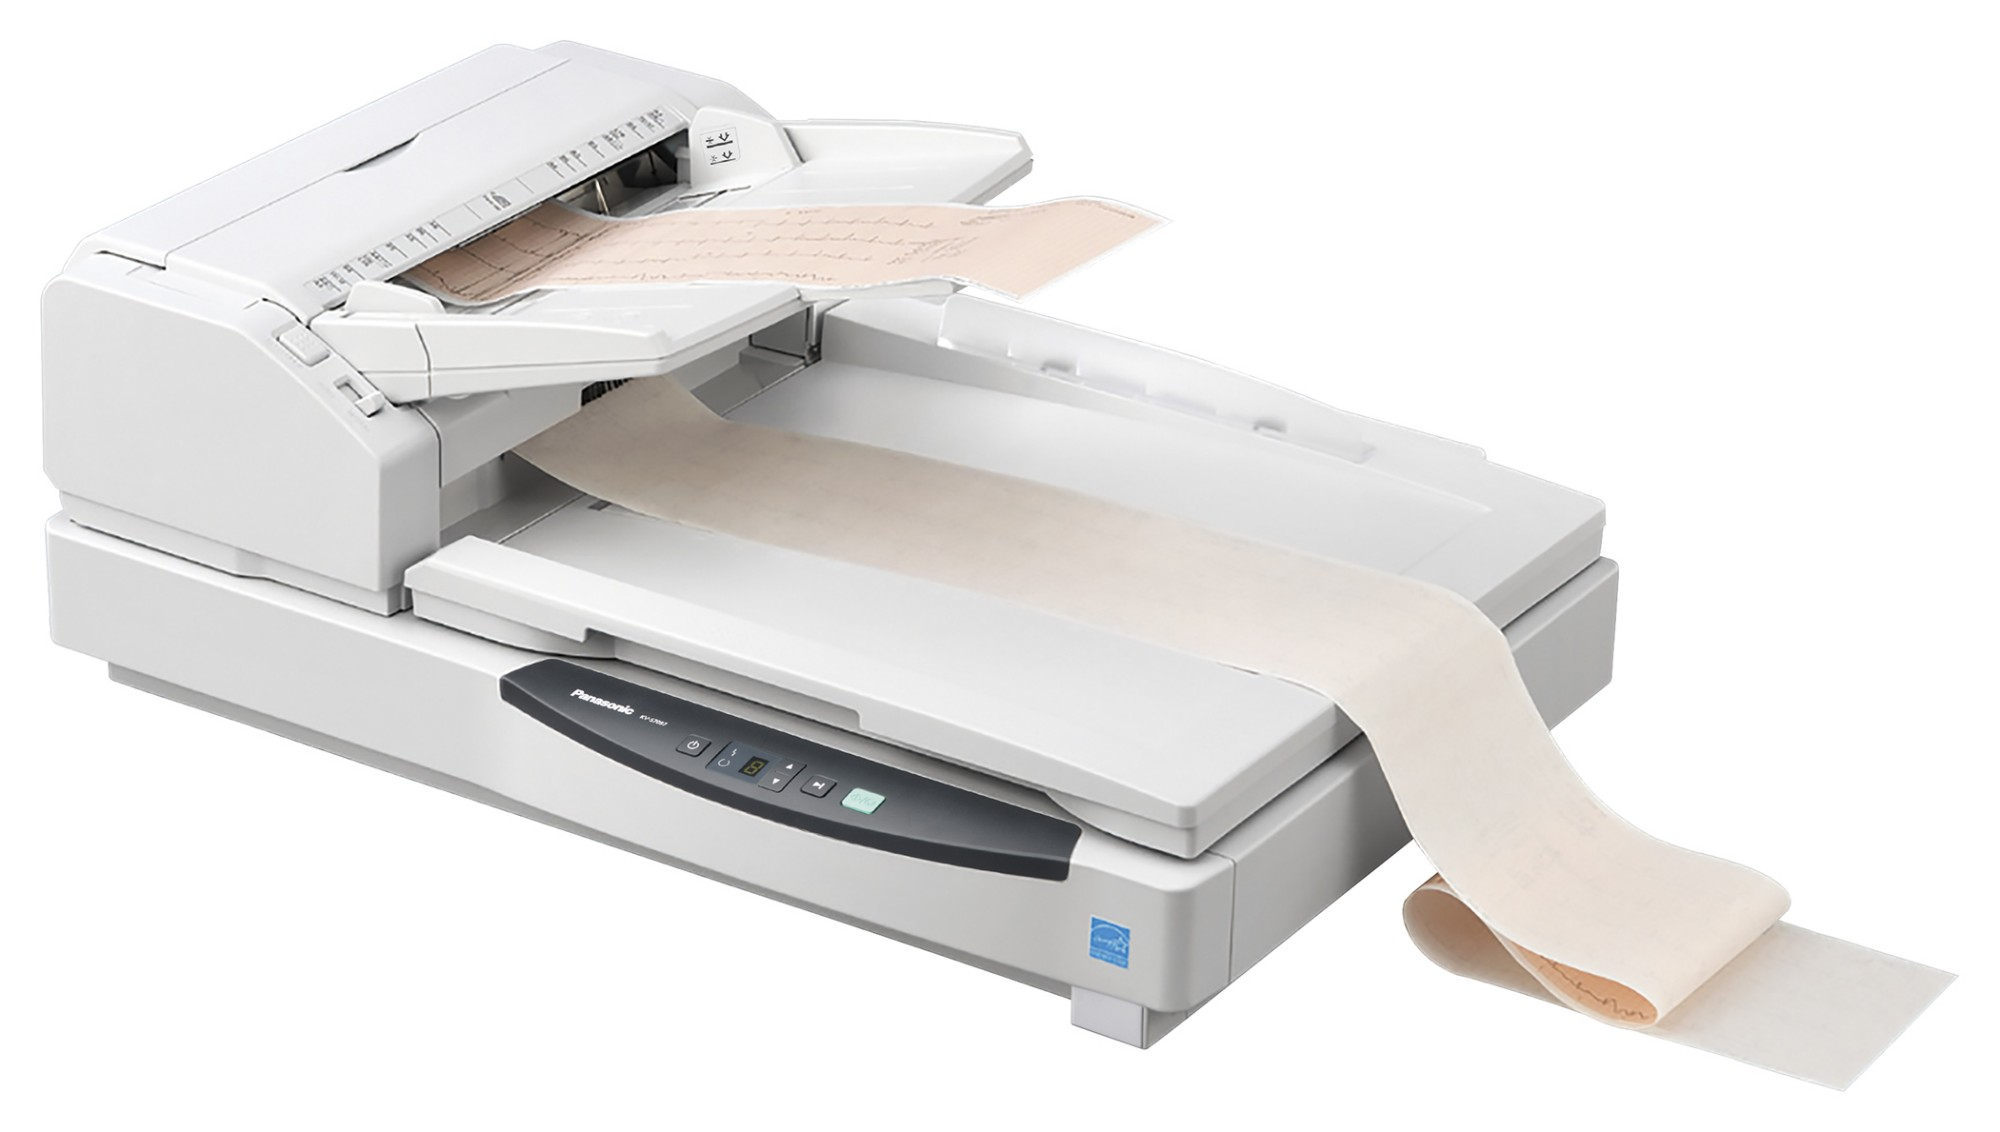 Panasonic KV-S7097 600 x 600 DPI Flatbed & ADF scanner White A3